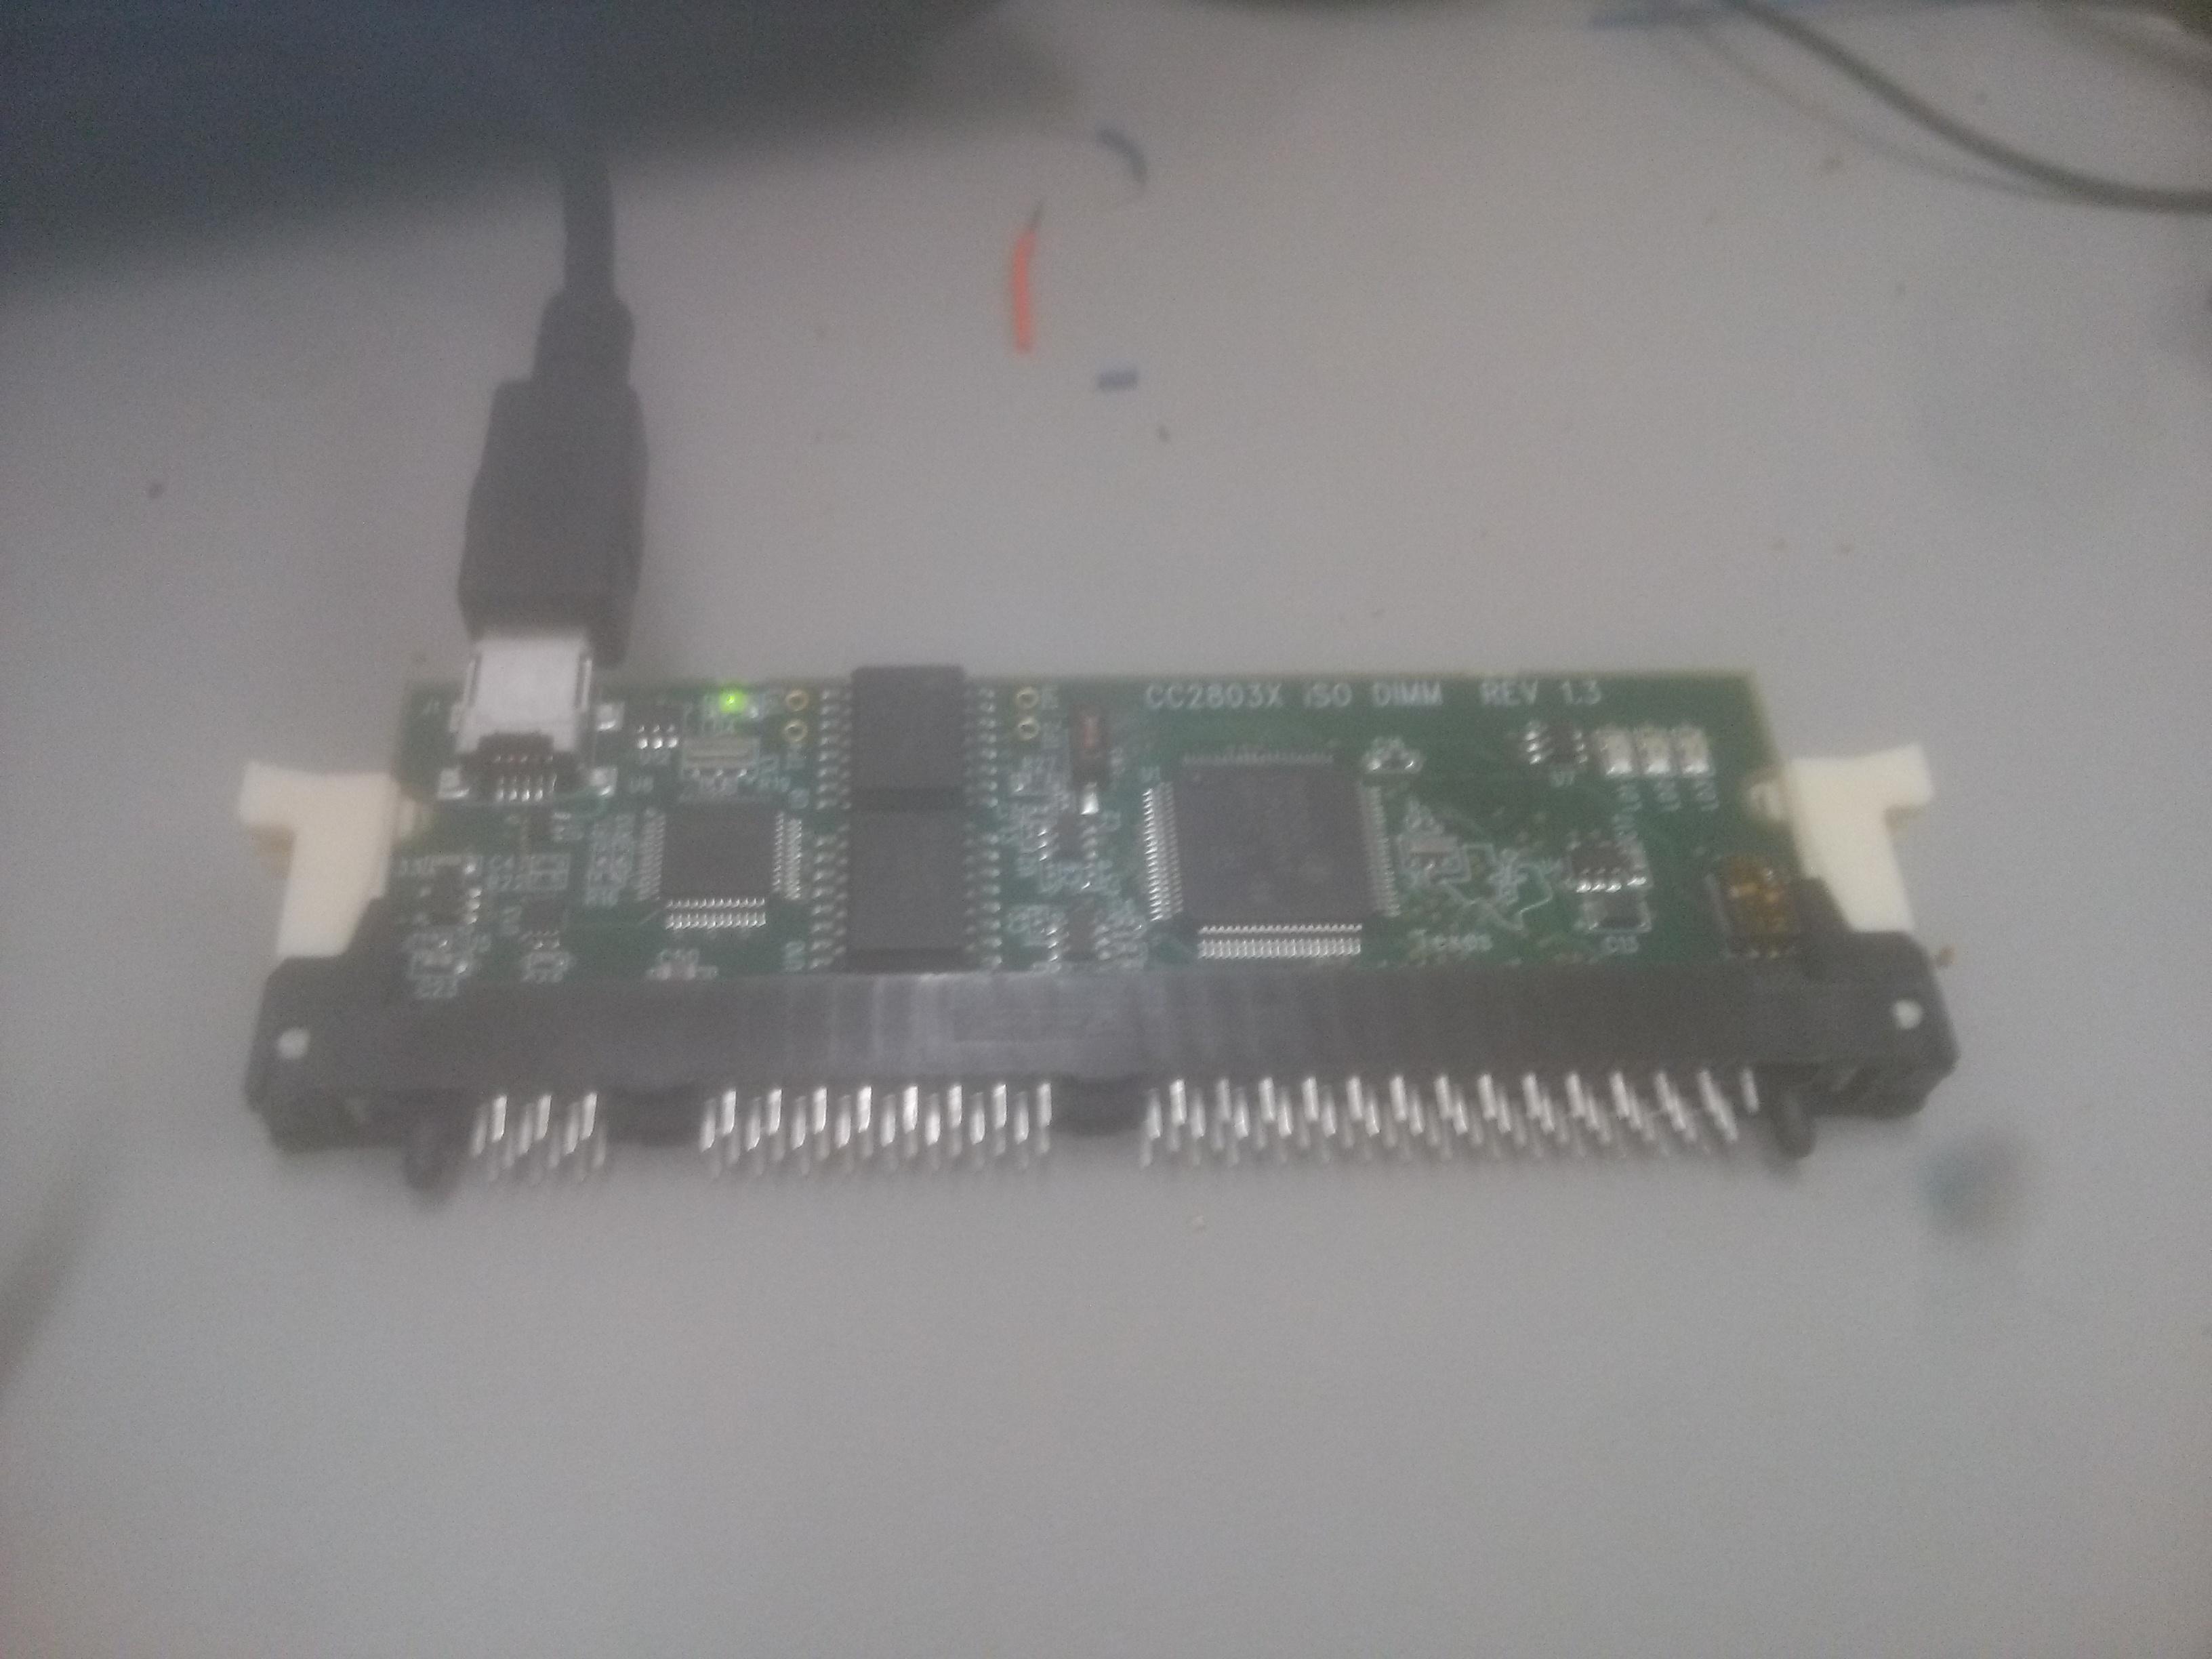 Ir On Off Switch Using Microcontroller Eeweb Community